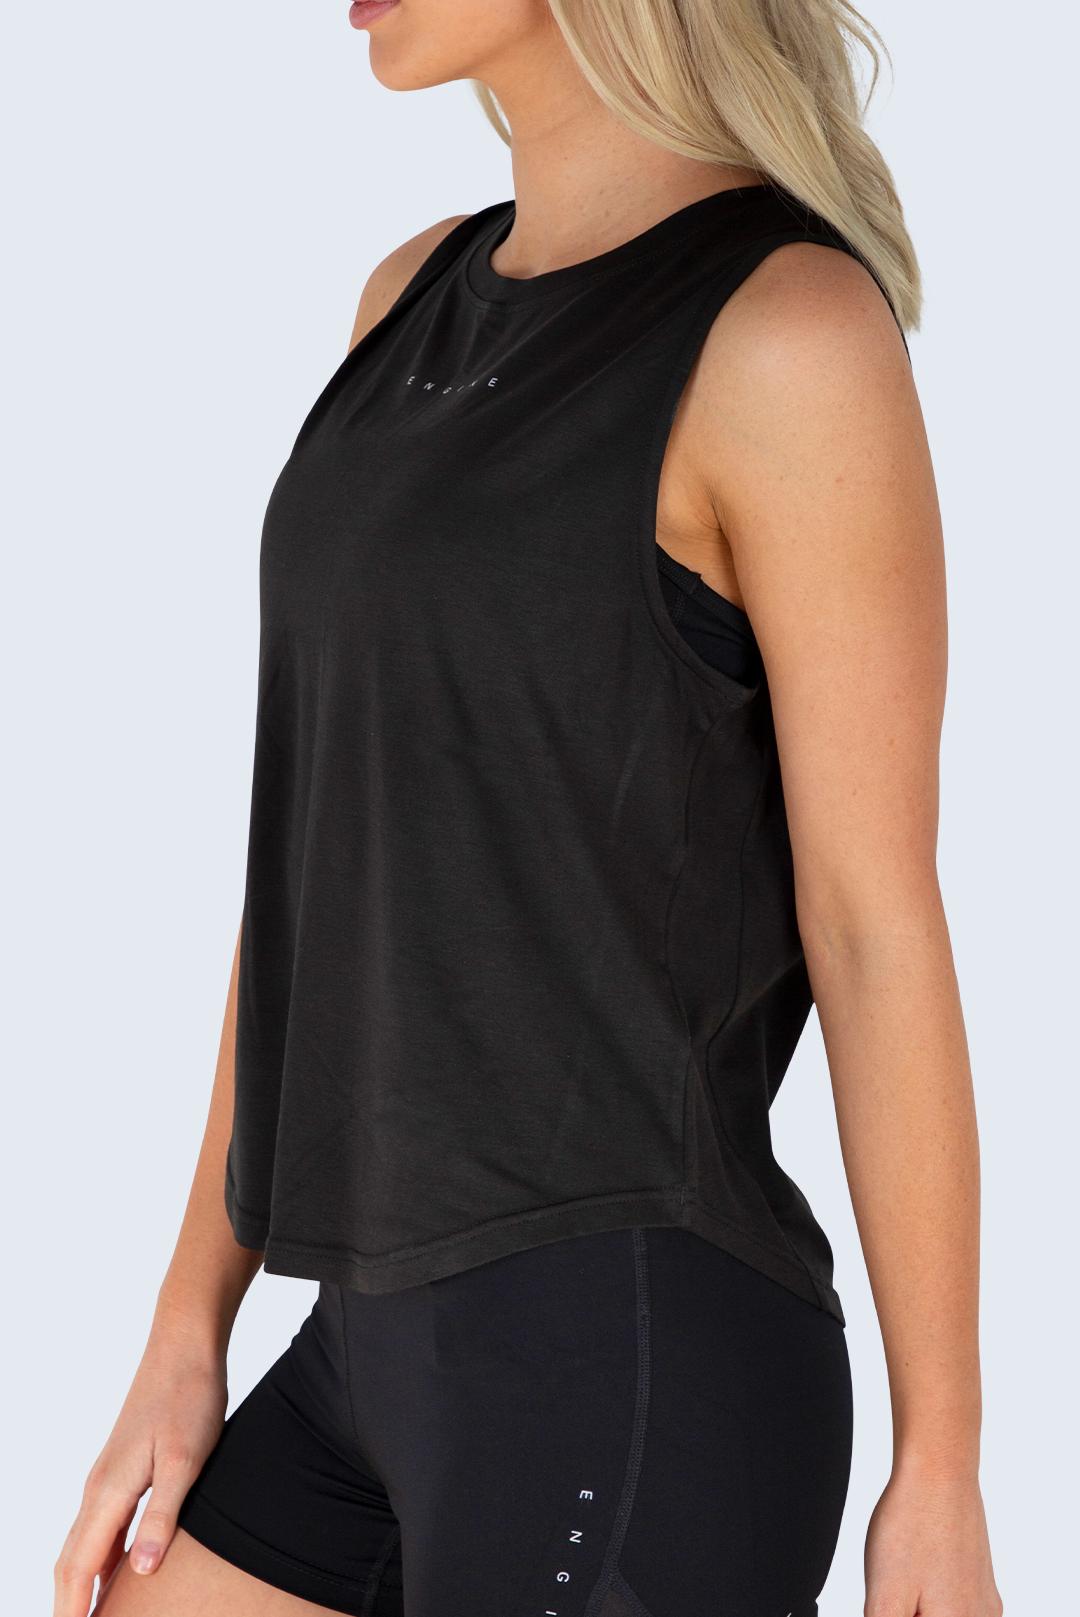 Women's Classic Muscle Tank - Black